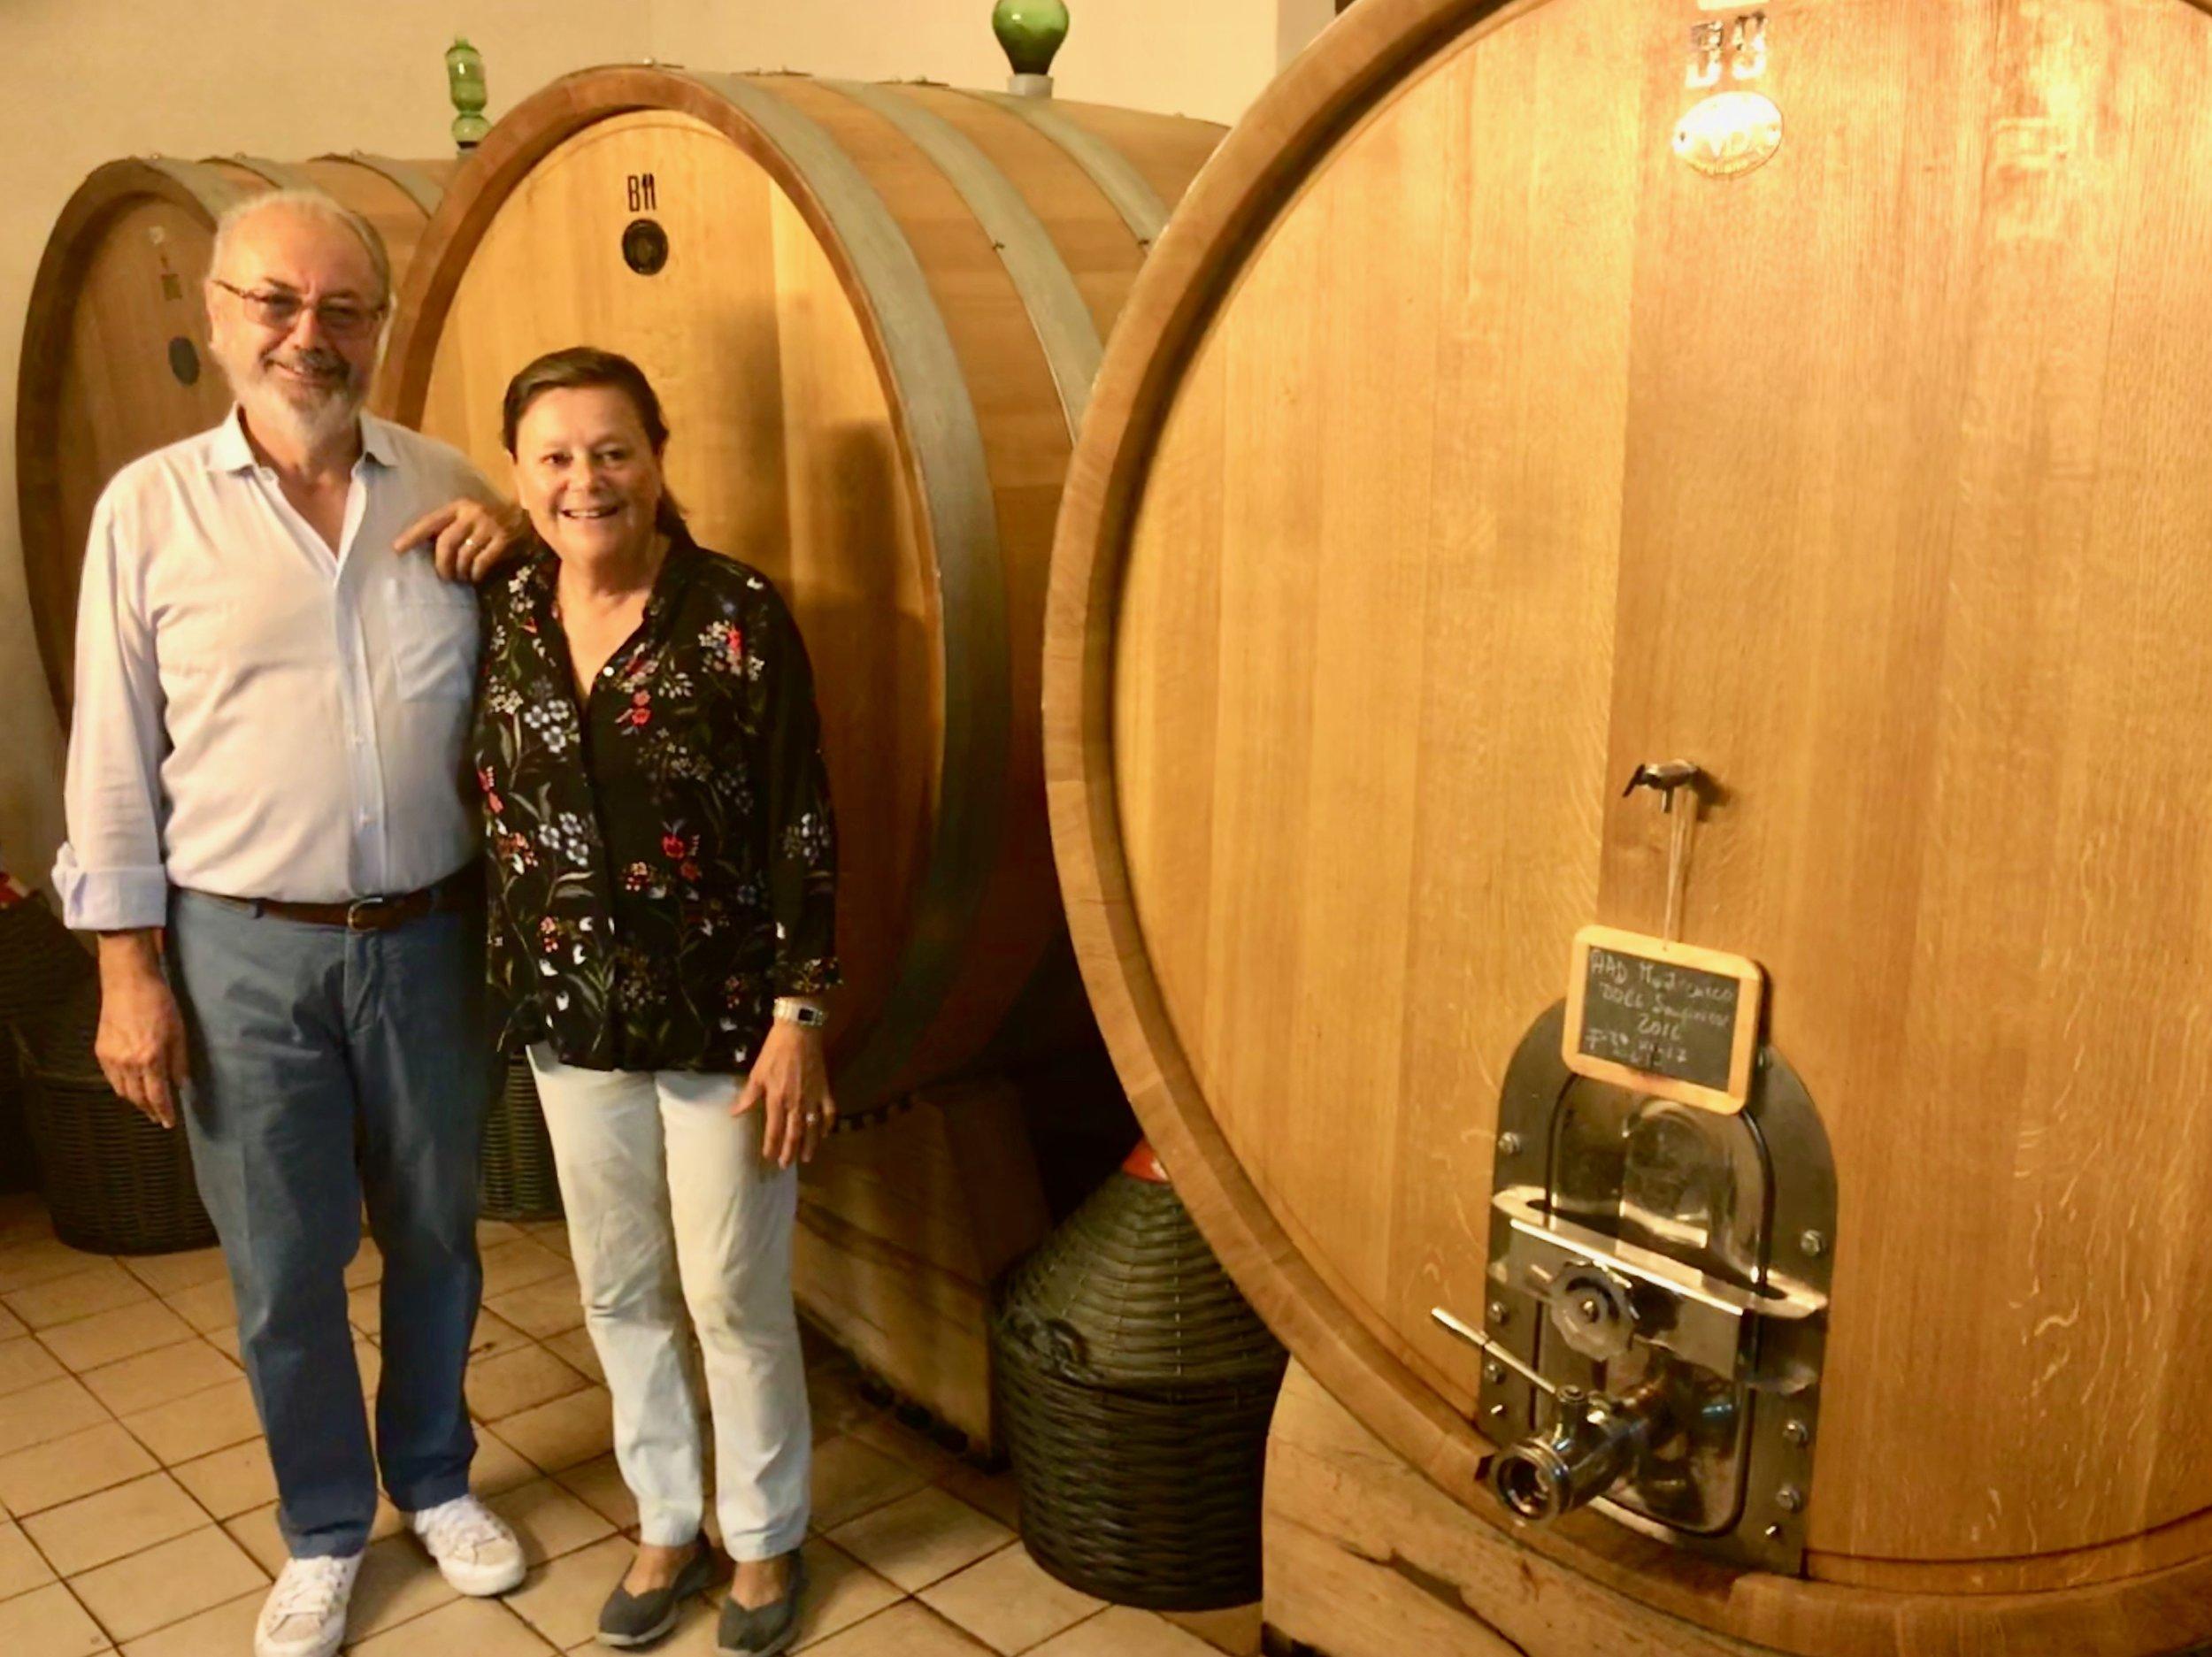 Georgio Nelli and Alda Chiarini of    Poggio al Gello   , a small winery producing organically-certified wines from indigenous varieties